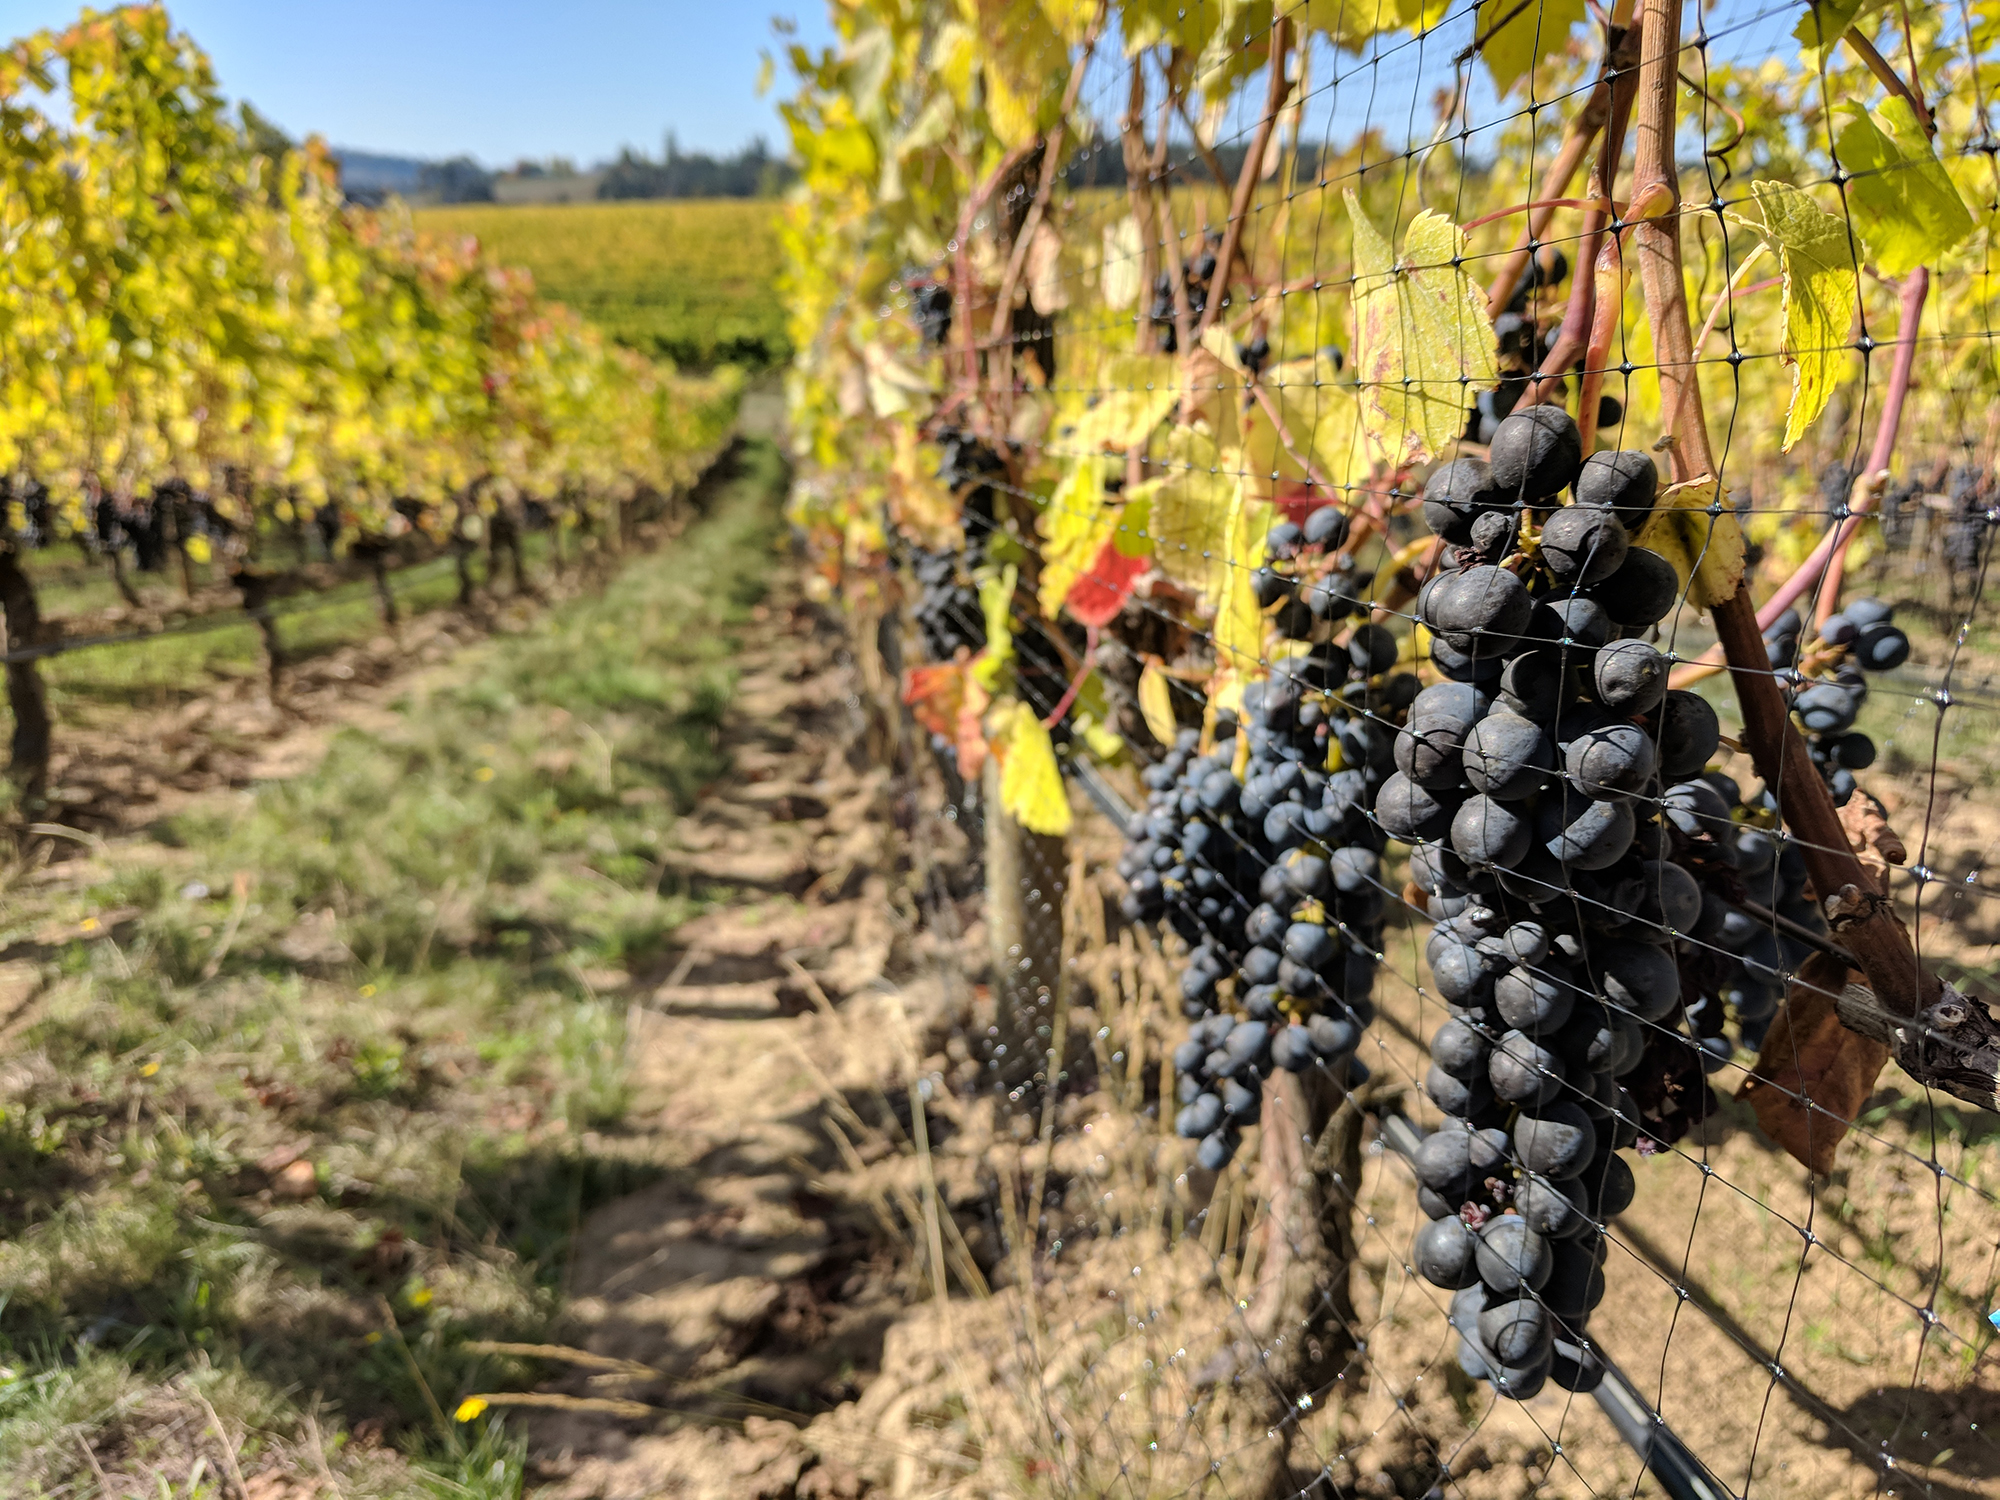 syrah grapes on vine.jpg